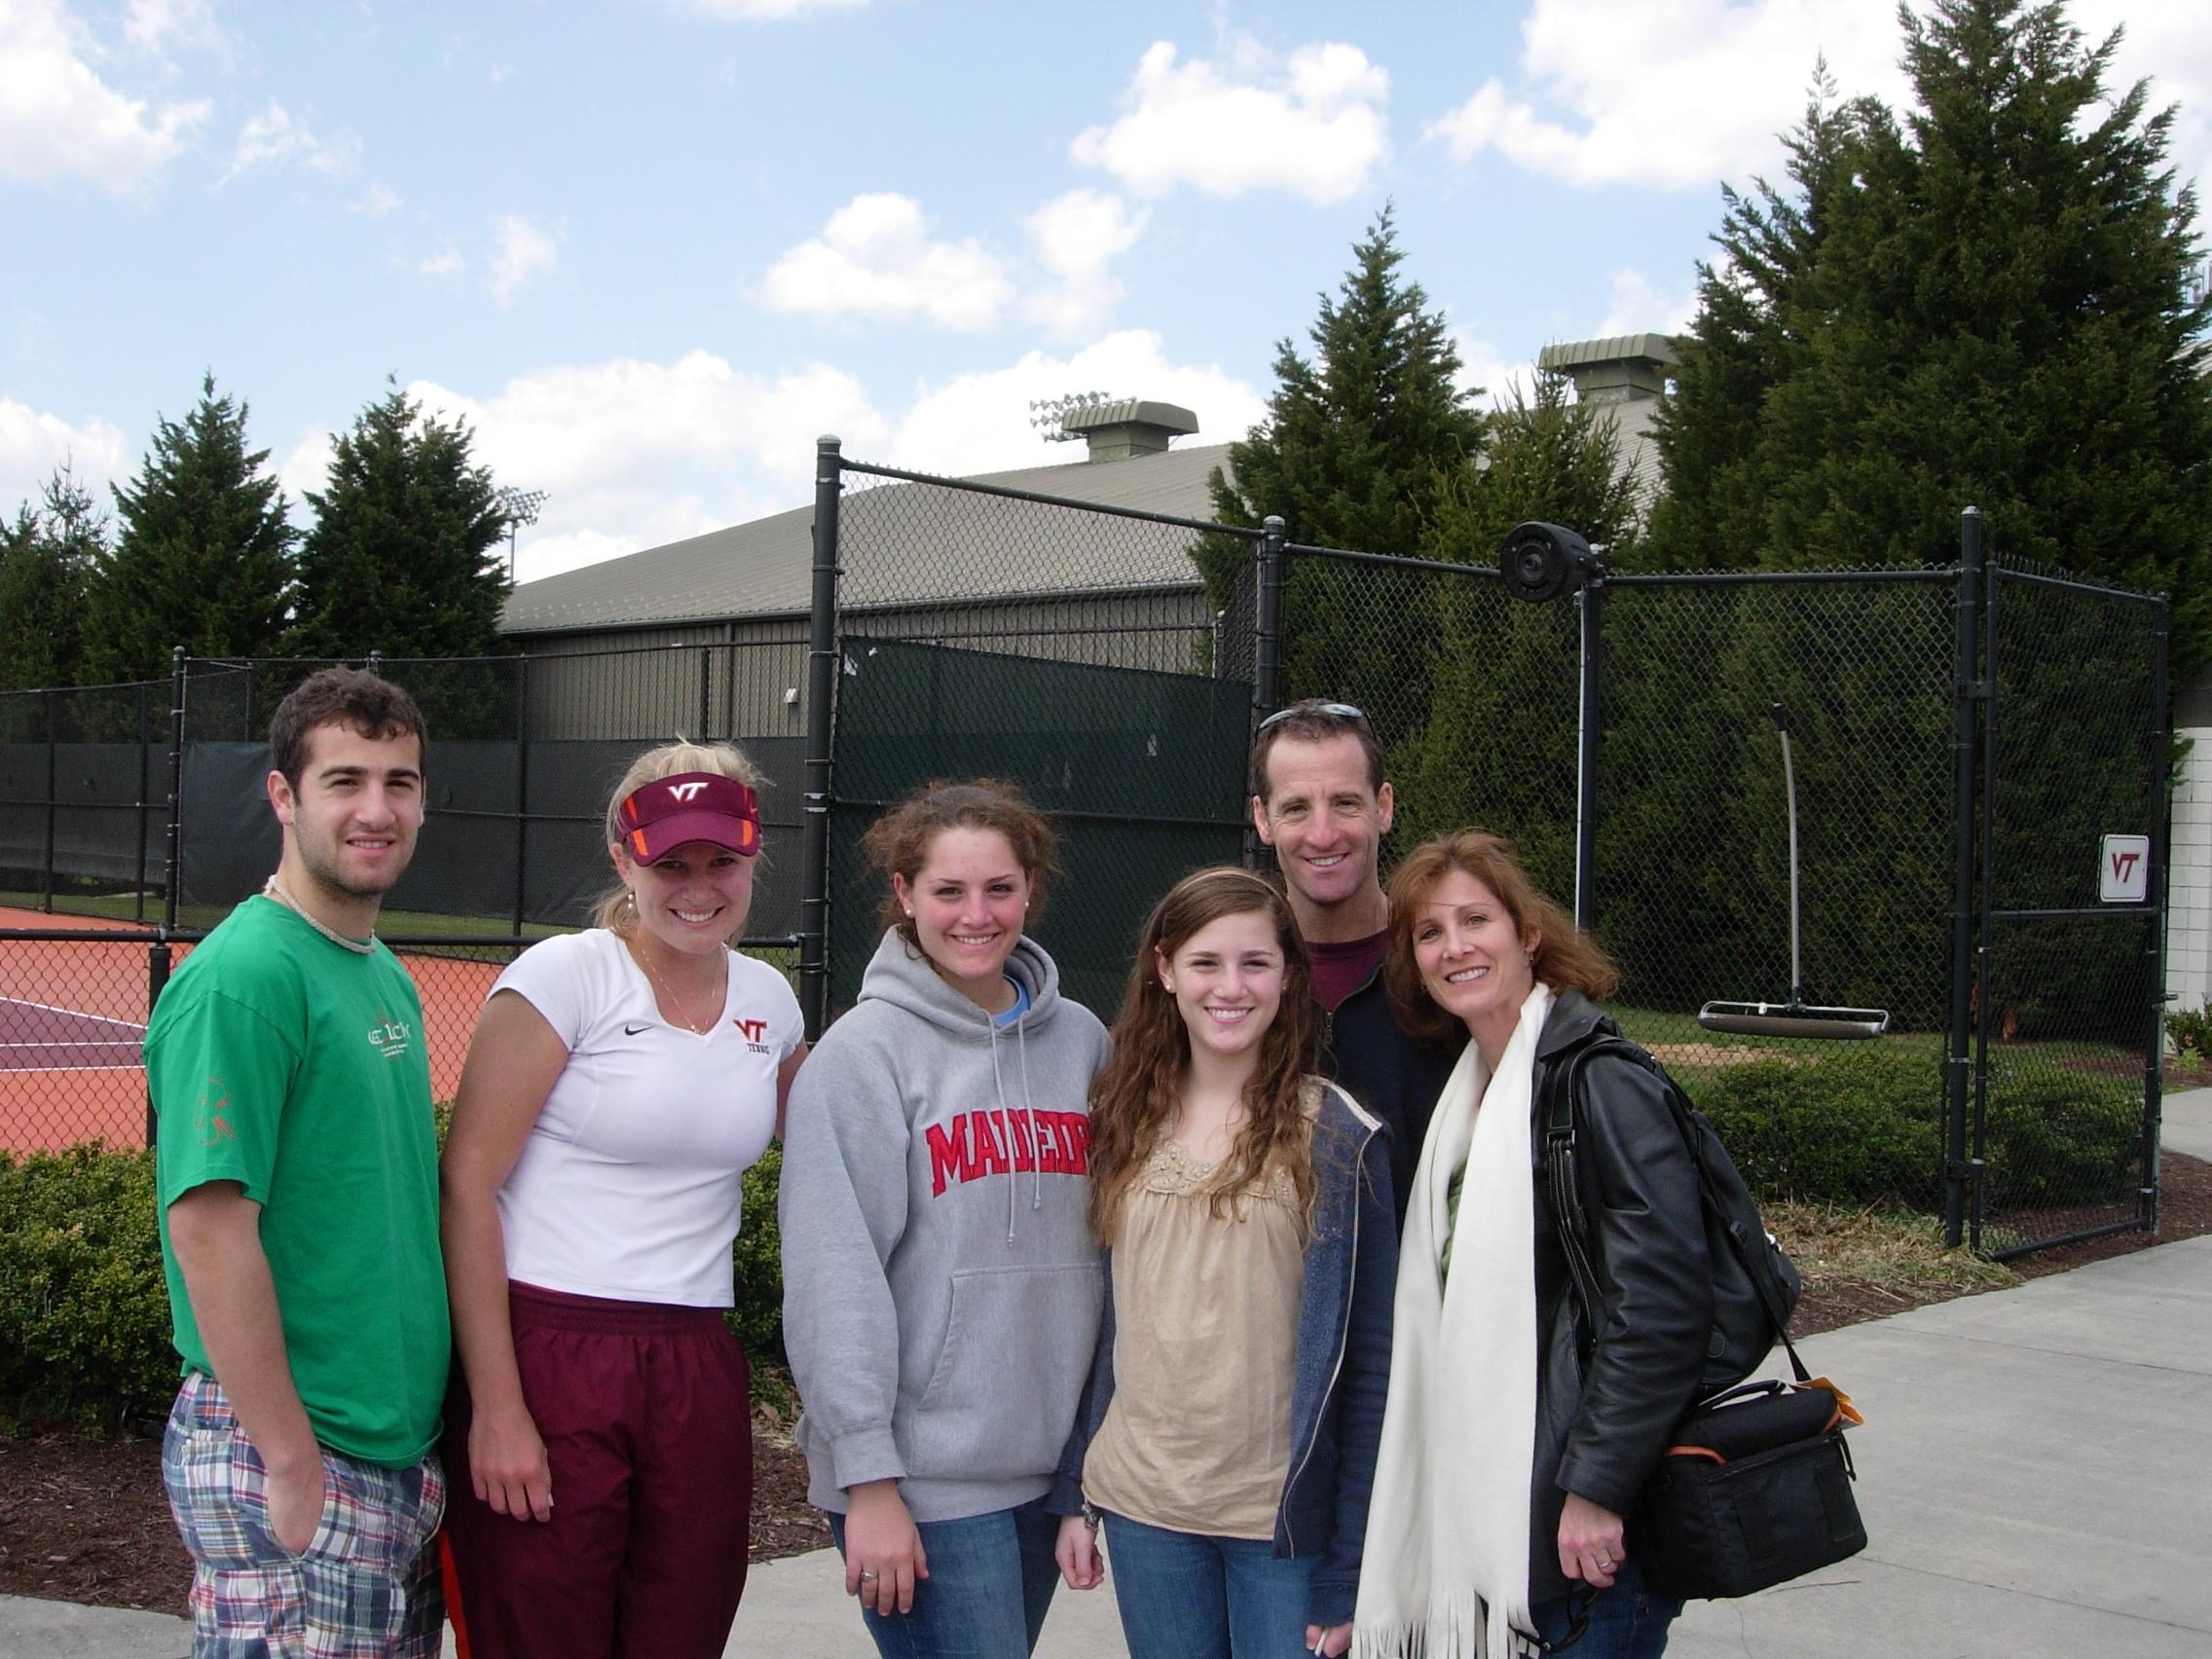 Virginia Tech tennis ace JJ Larson and the Landau family